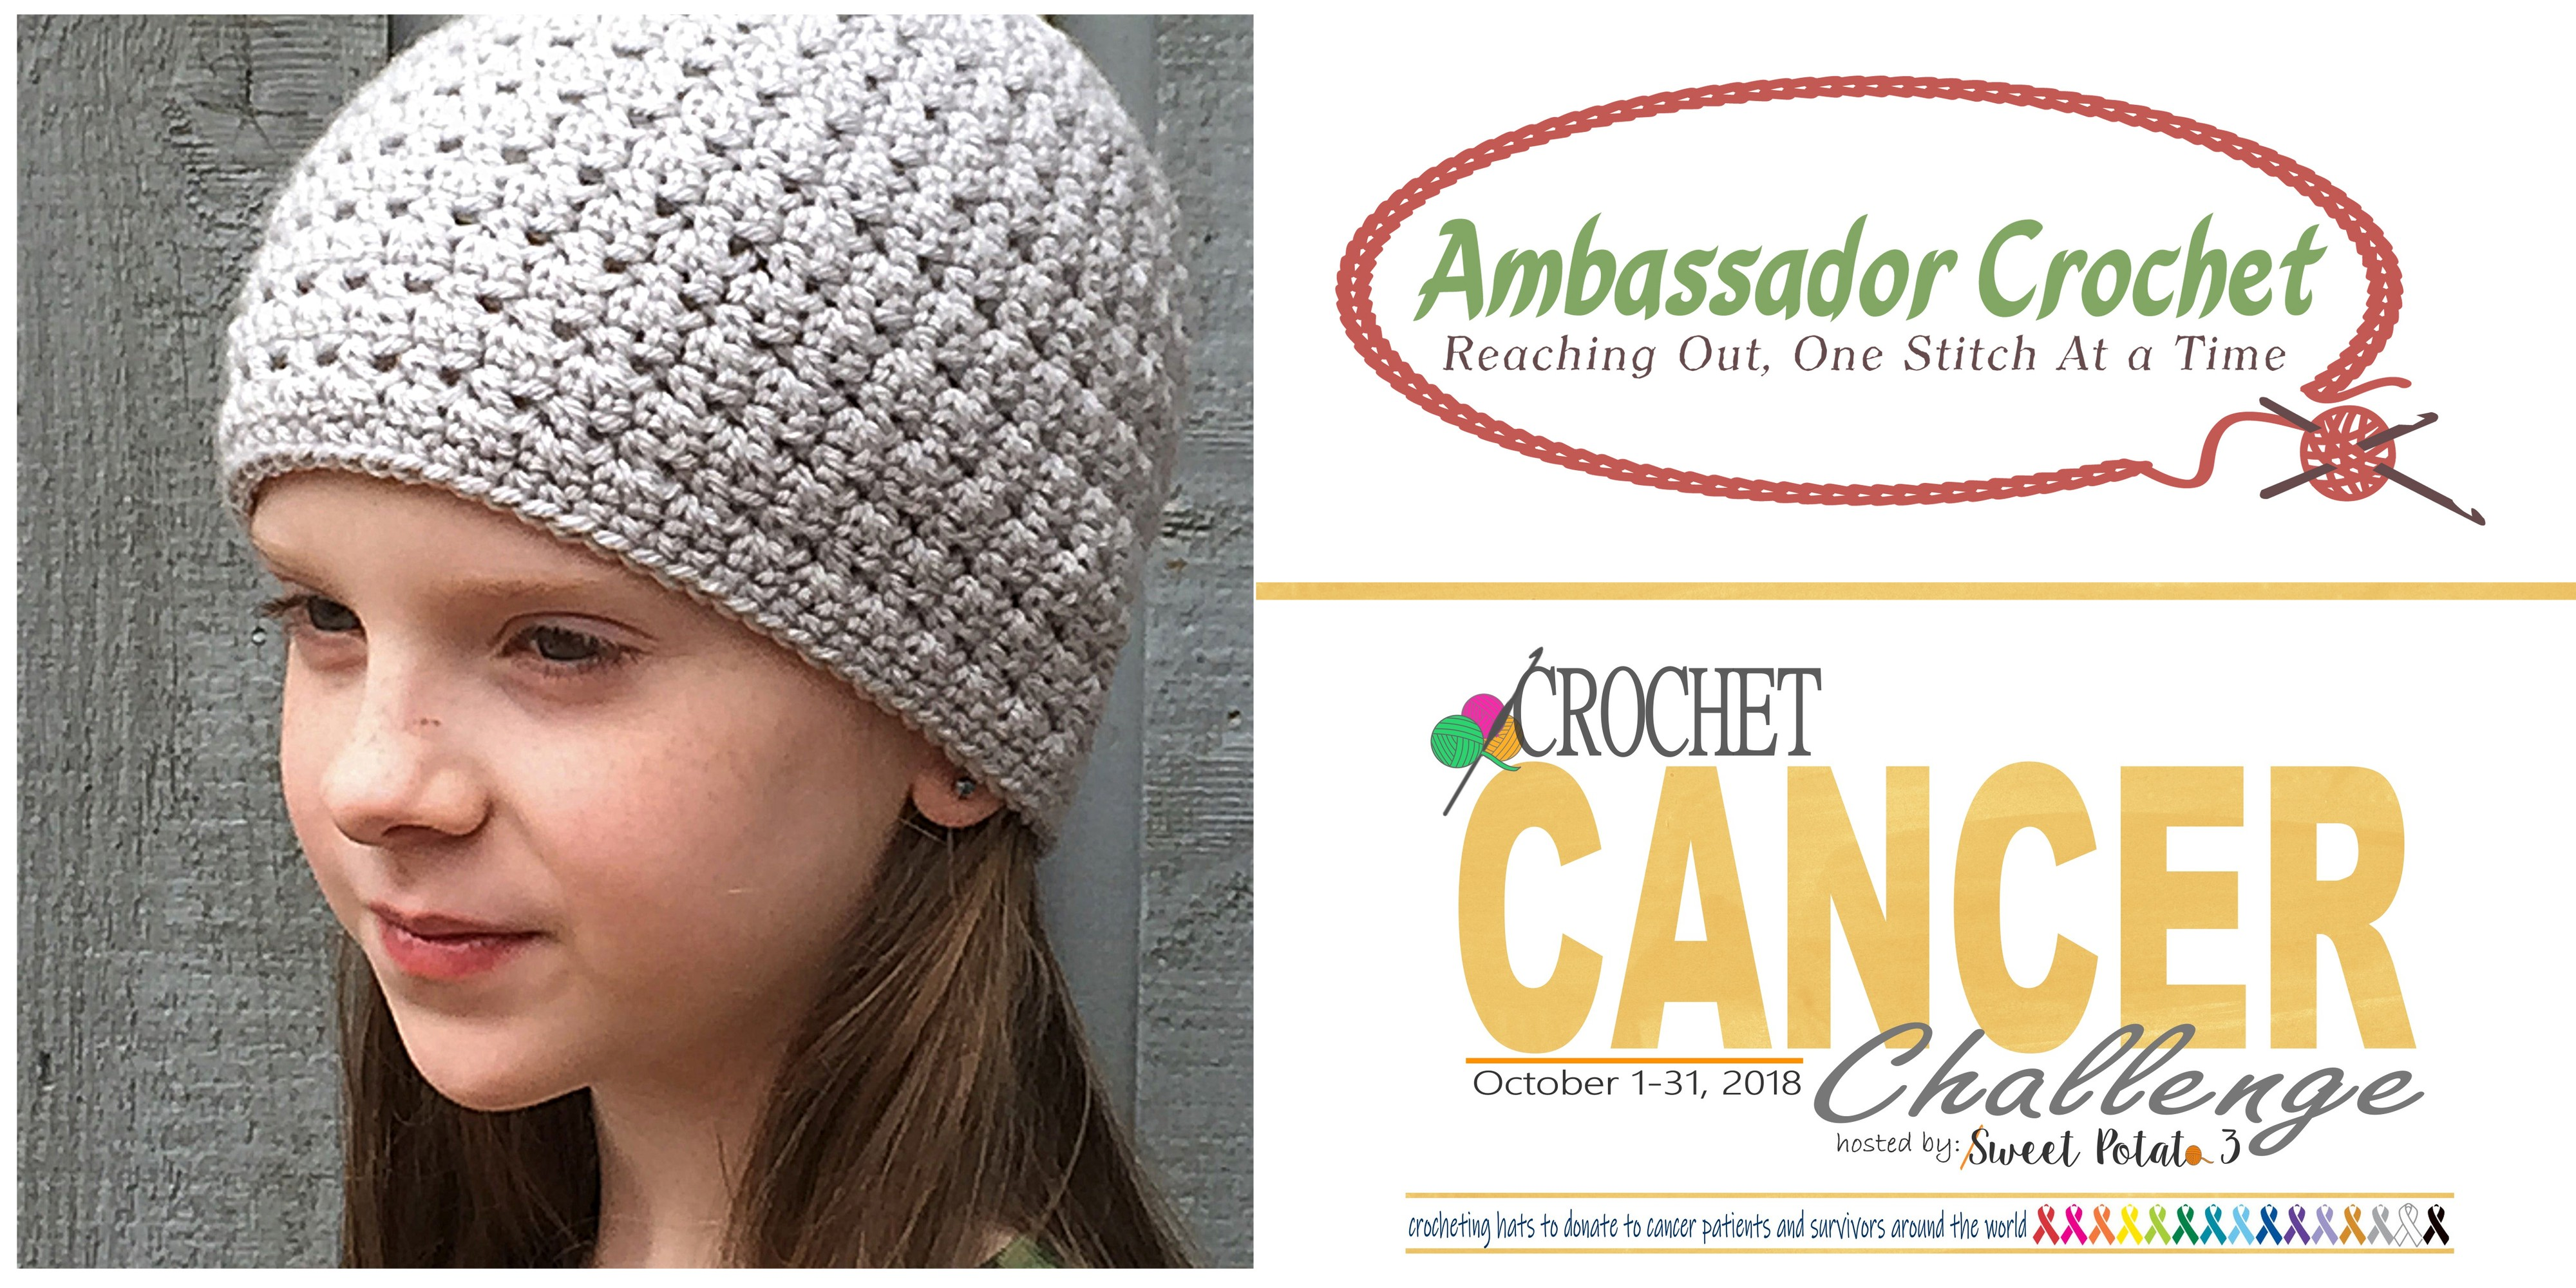 Day 12 Cancer Challenge Ambassador Crochet Sweet Potato 3